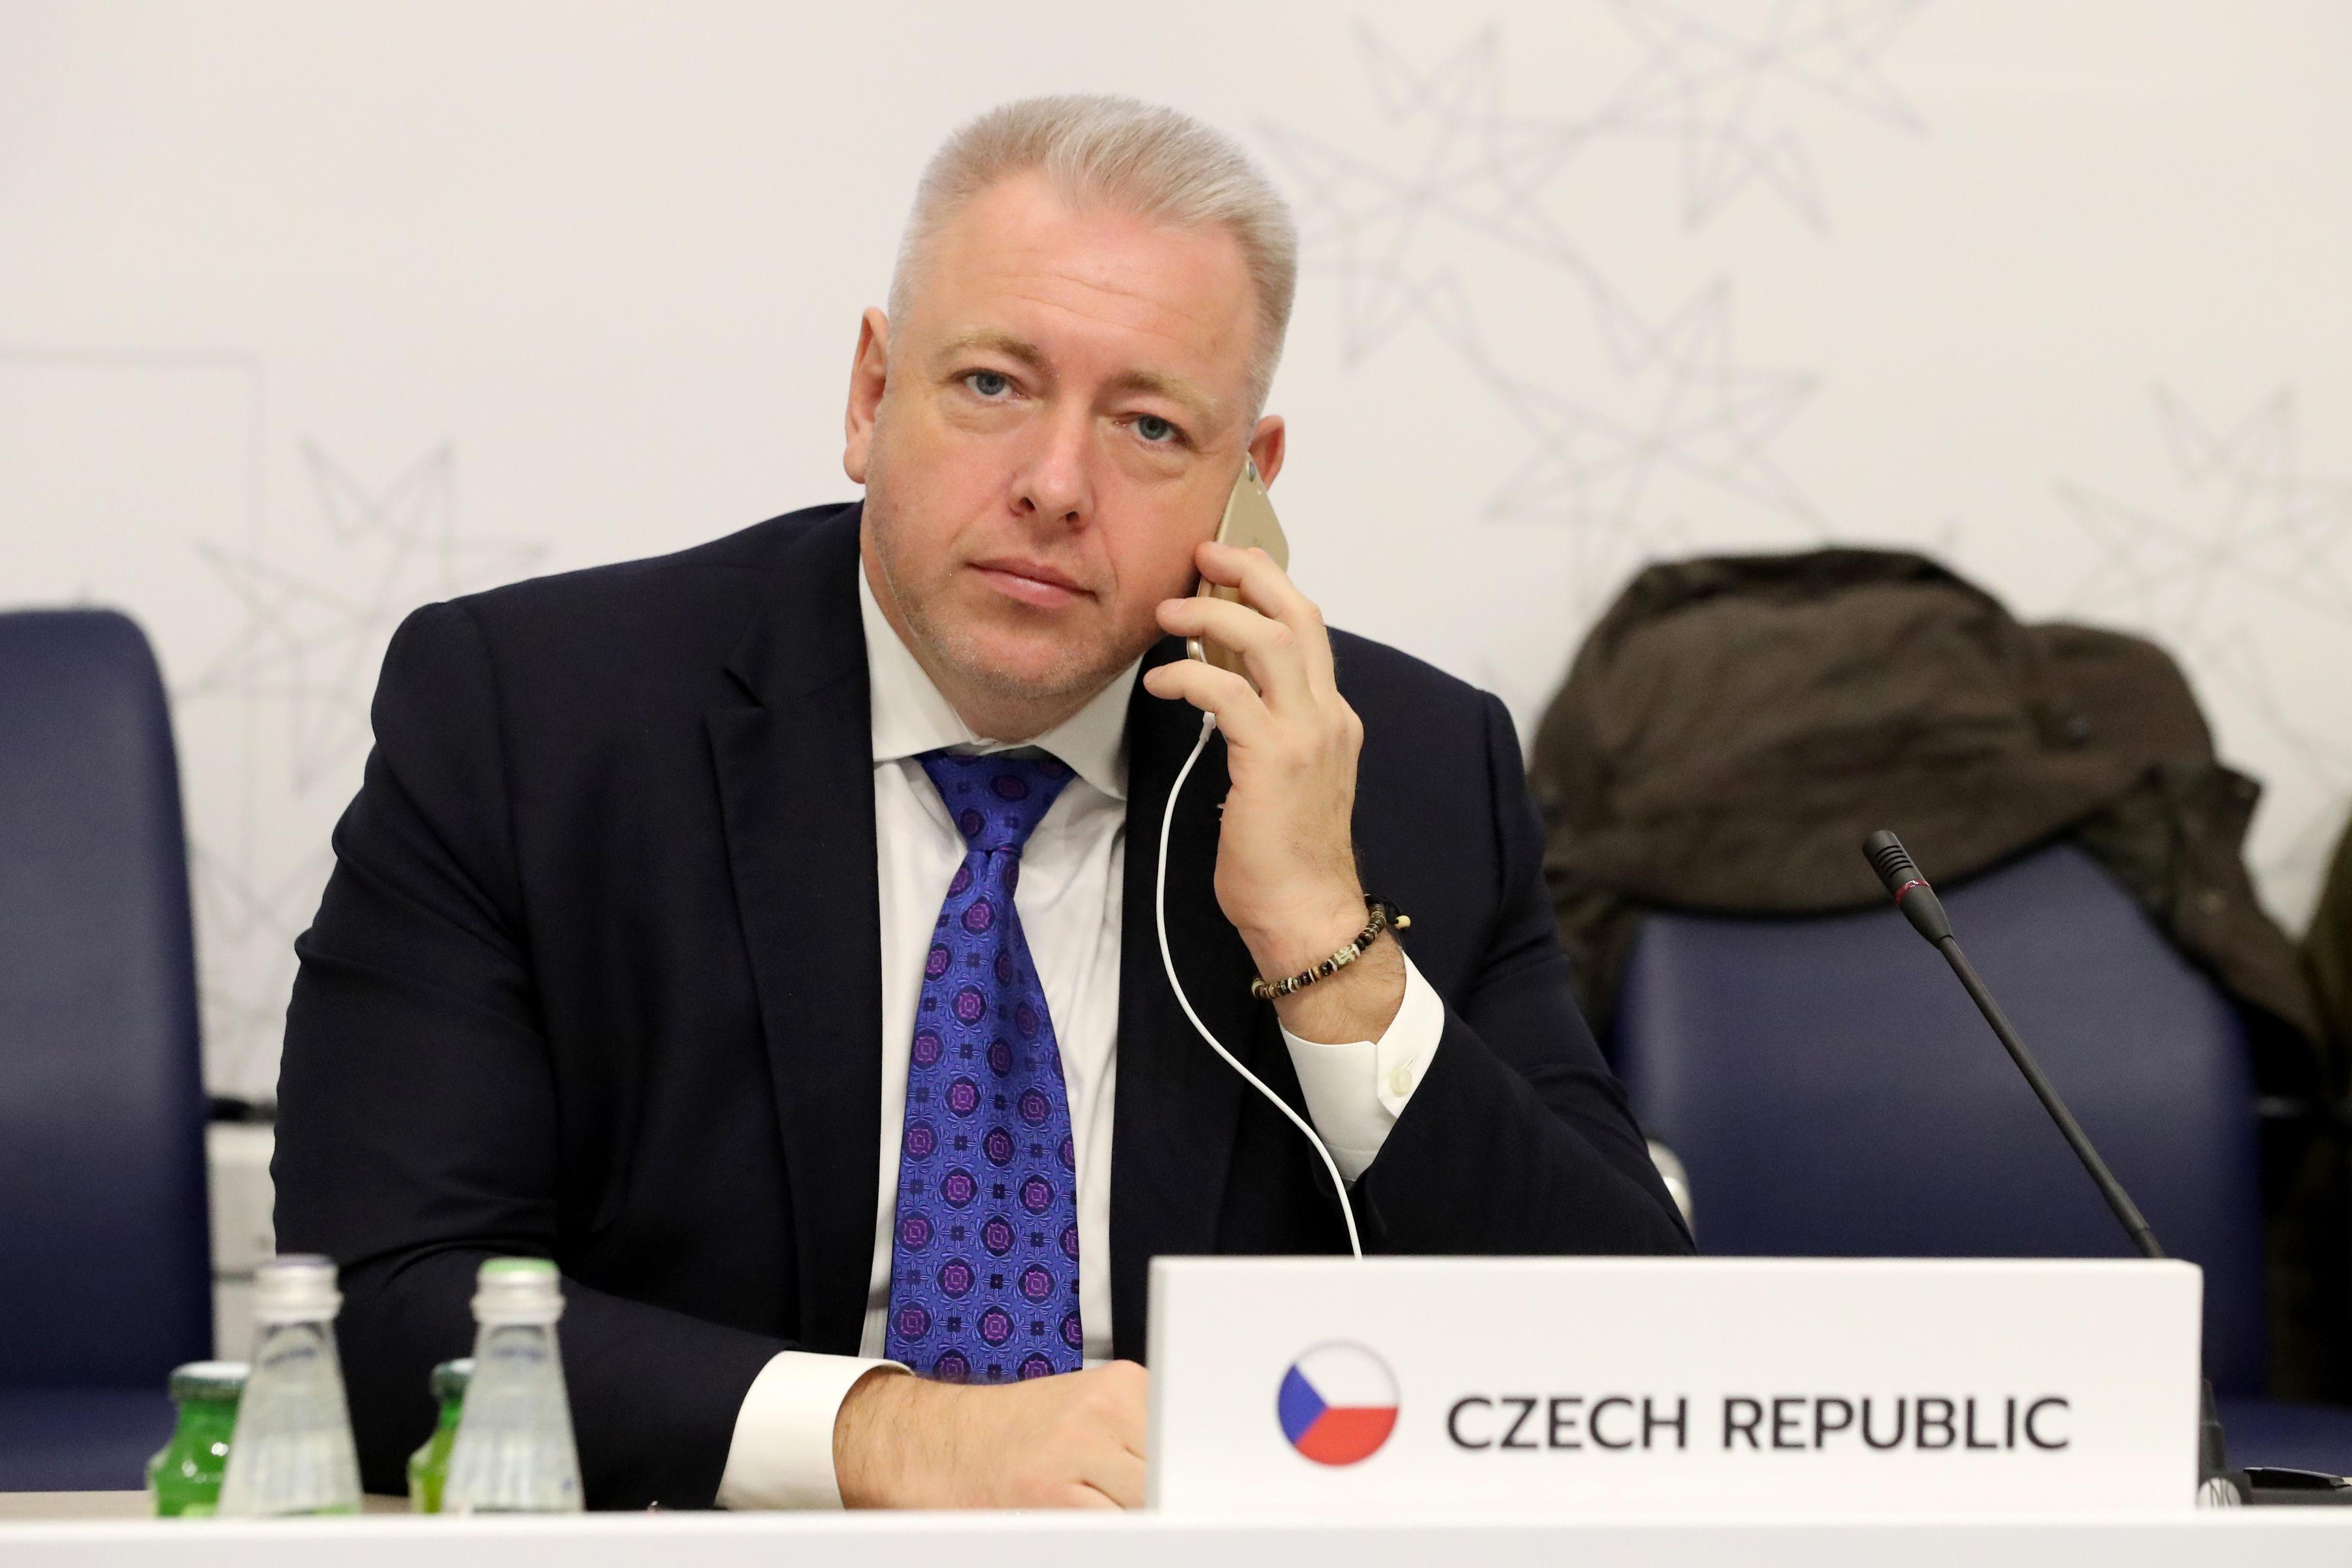 Czechs insist migration controls should precede relocation demands – EURACTIV.com